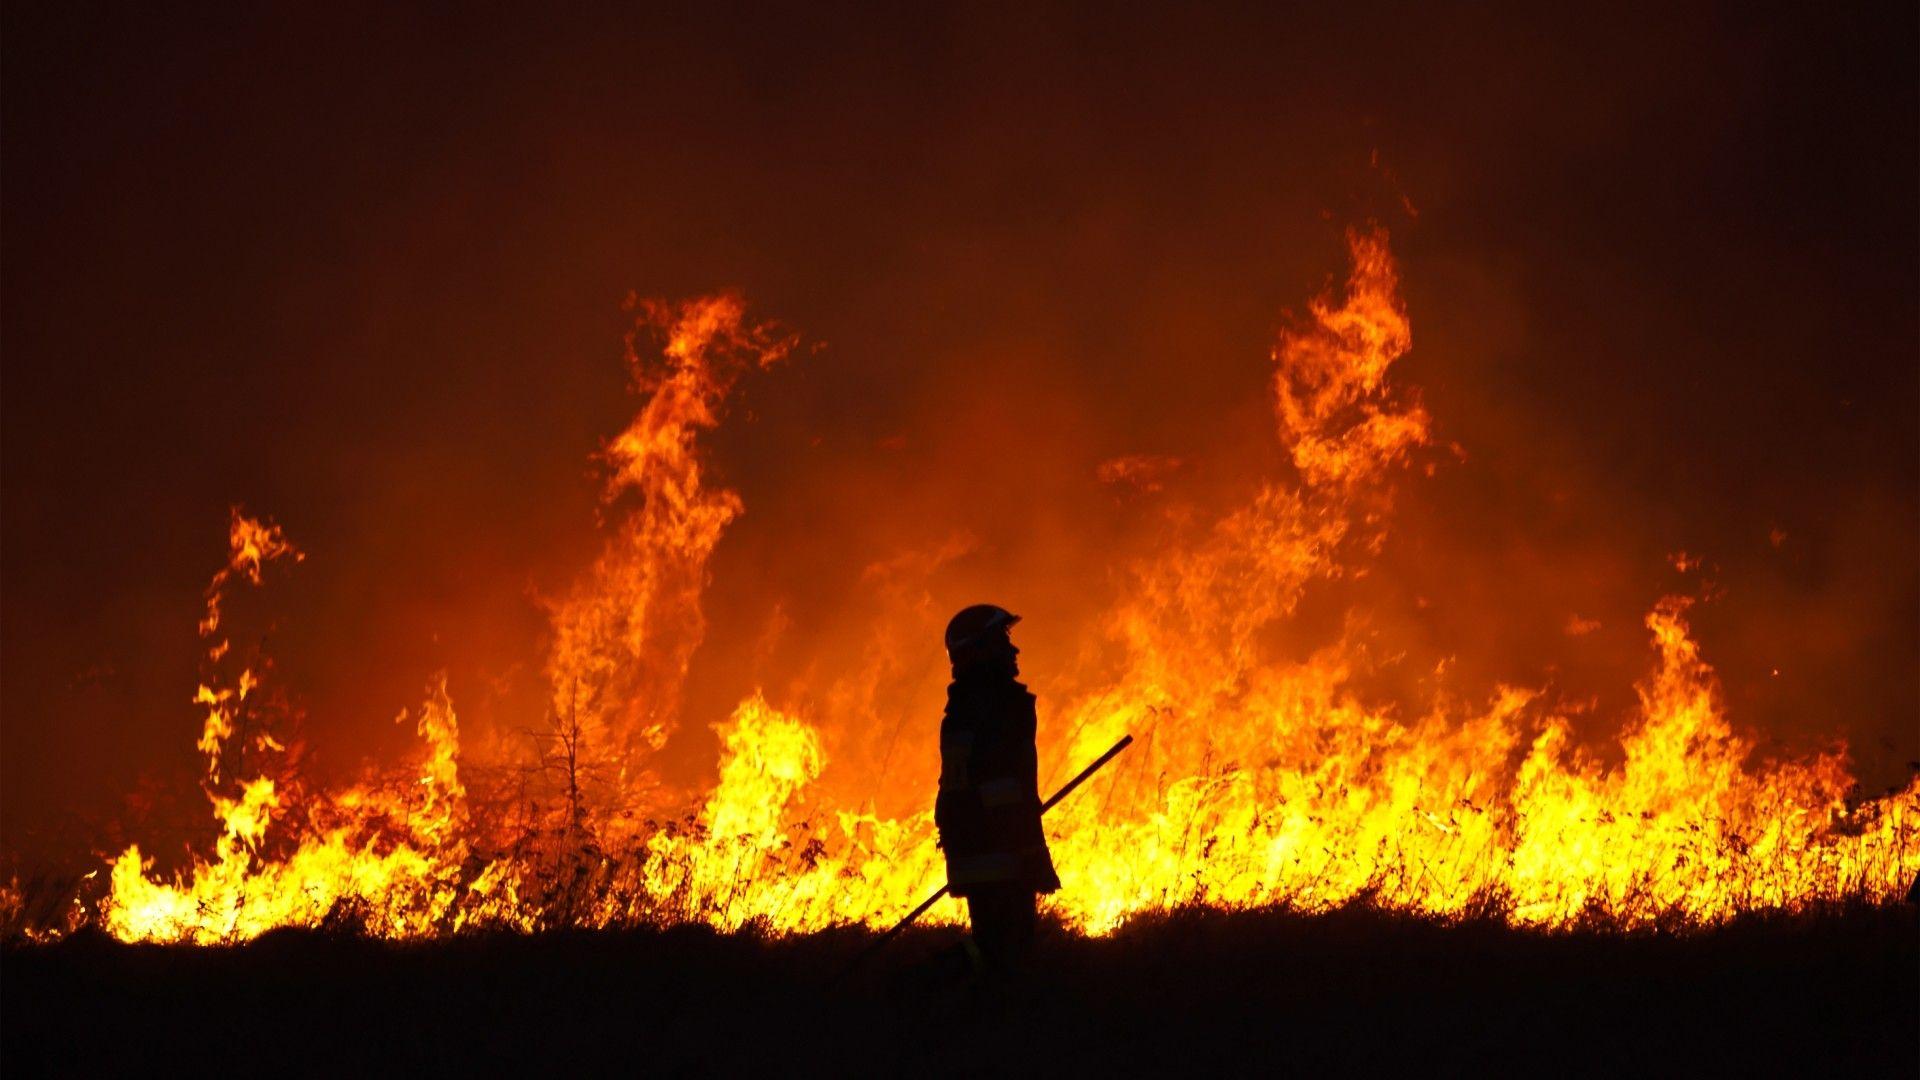 1920x1080 Desktop Background Fire Firefighter Flames Silhouette Fire Photography Beautiful Wallpaper Hd Fire Image